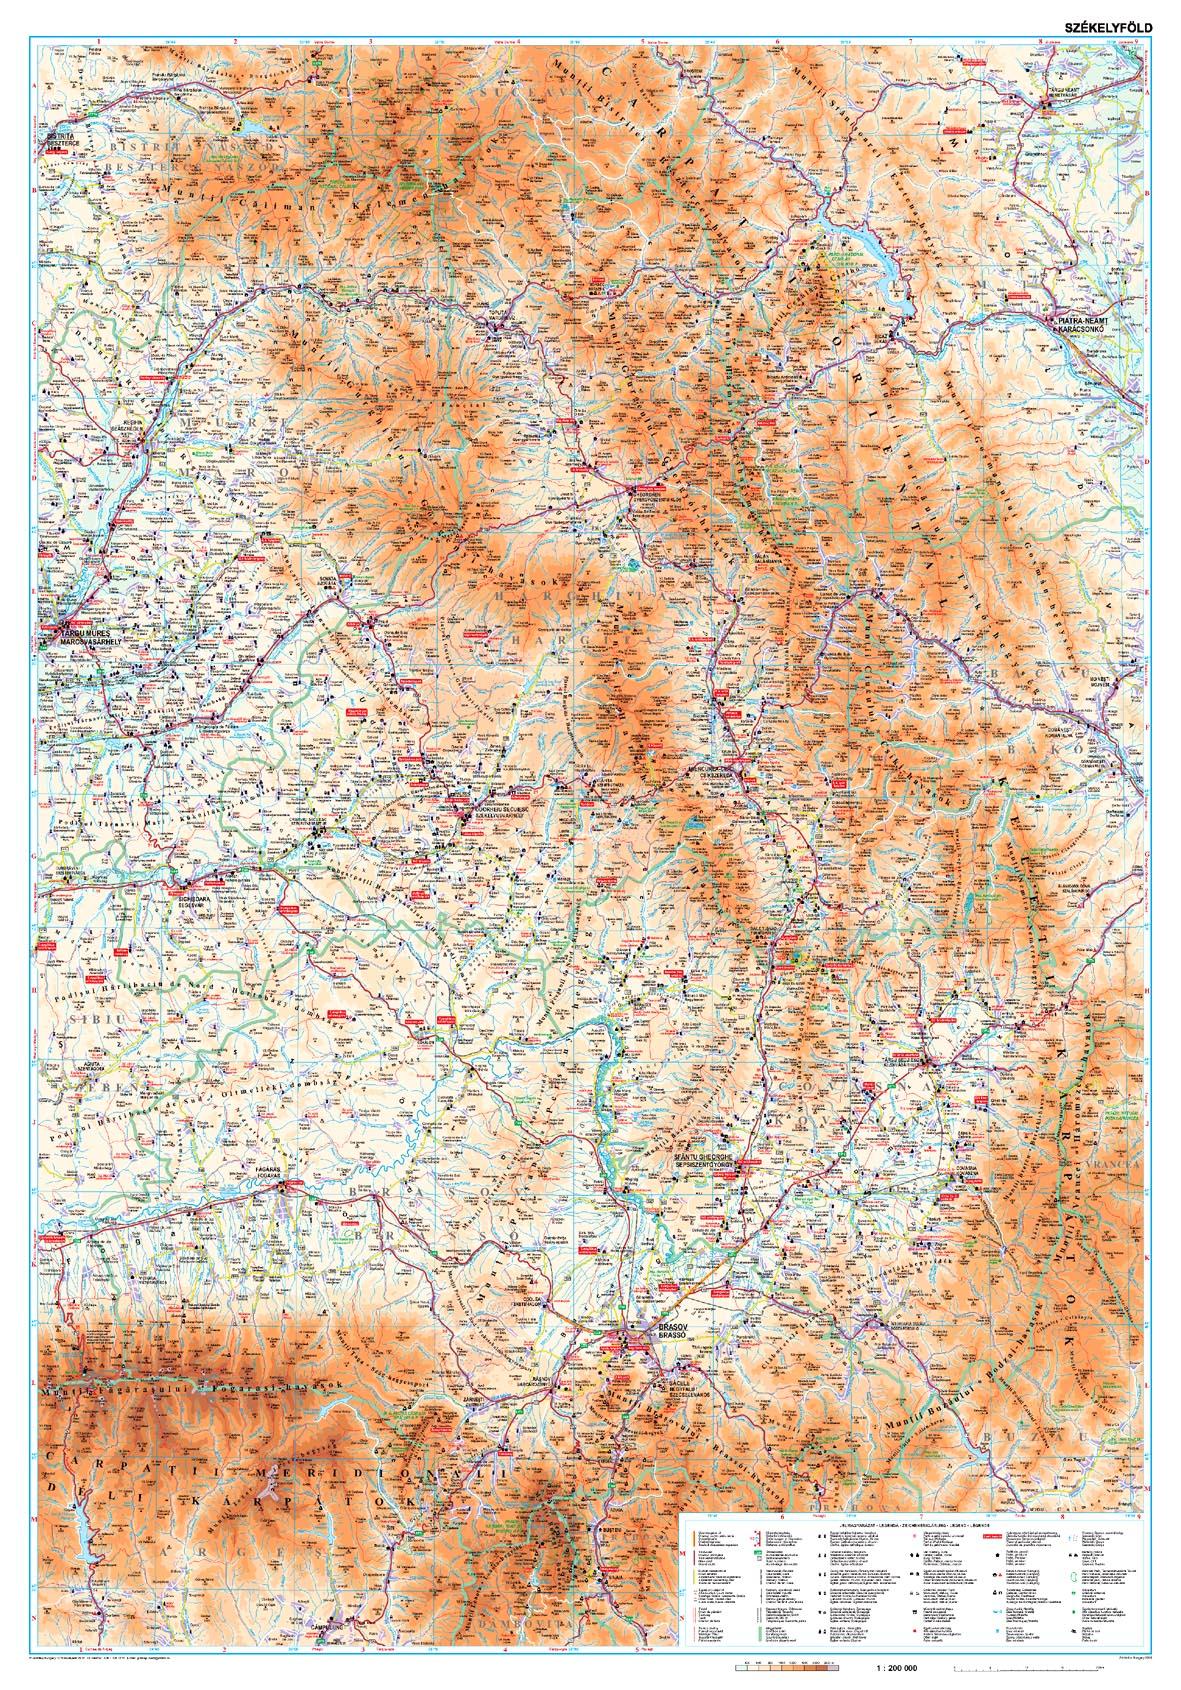 Transilvania SE overview map